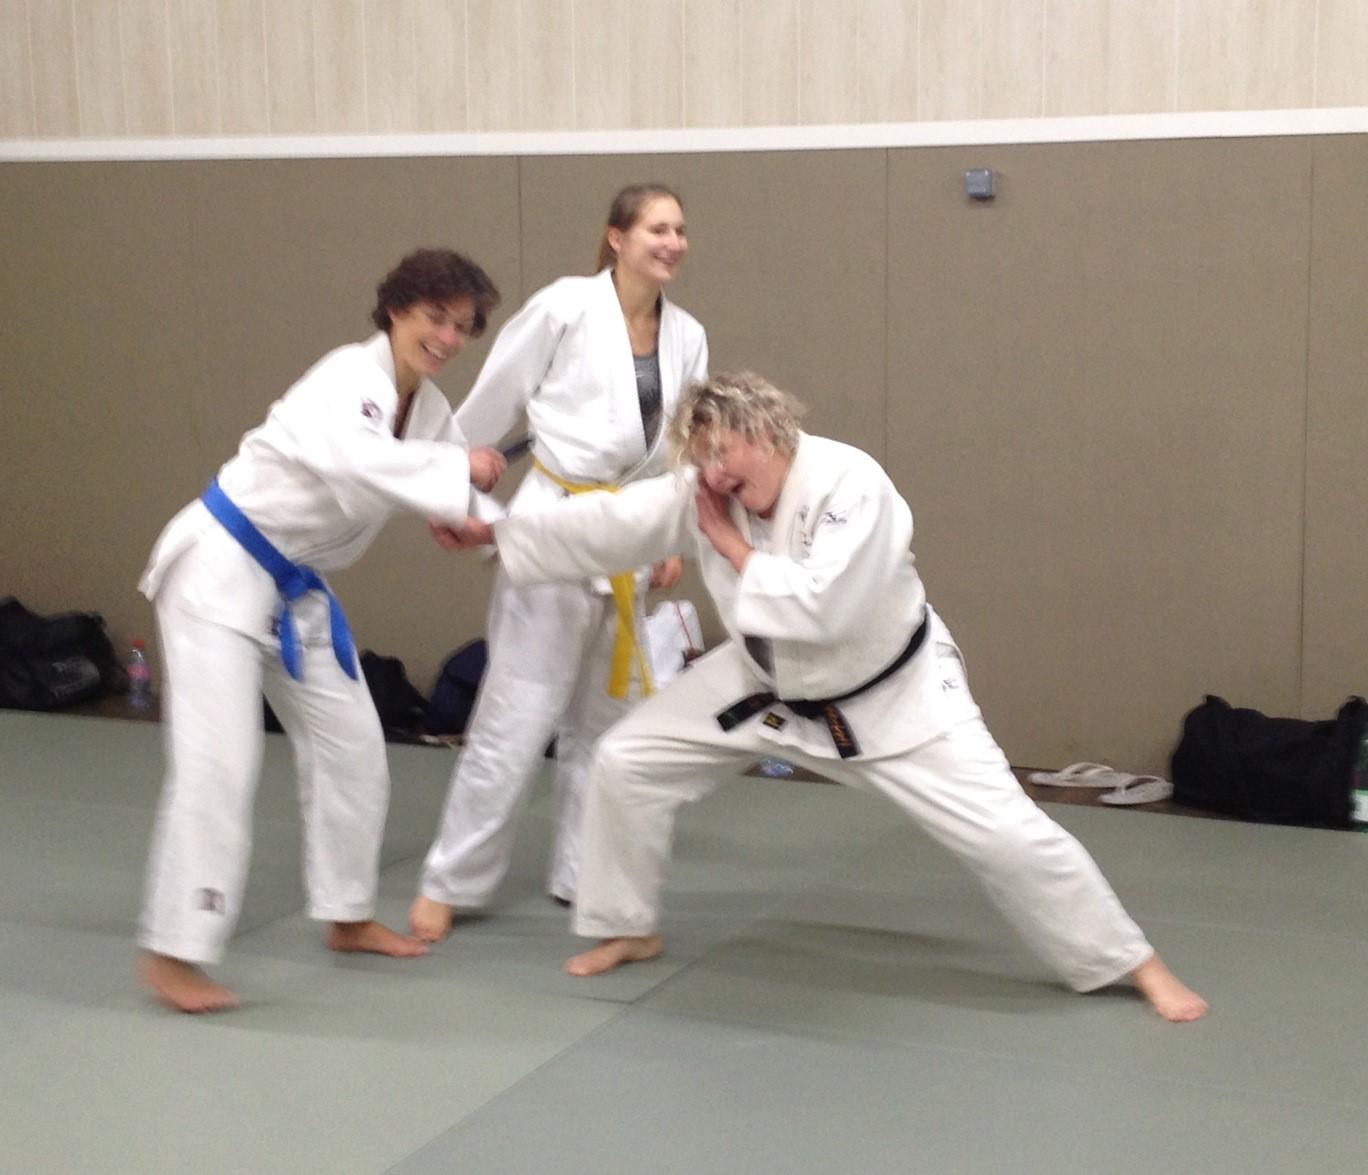 jujitsu-efjjsd-novembre-2013 12